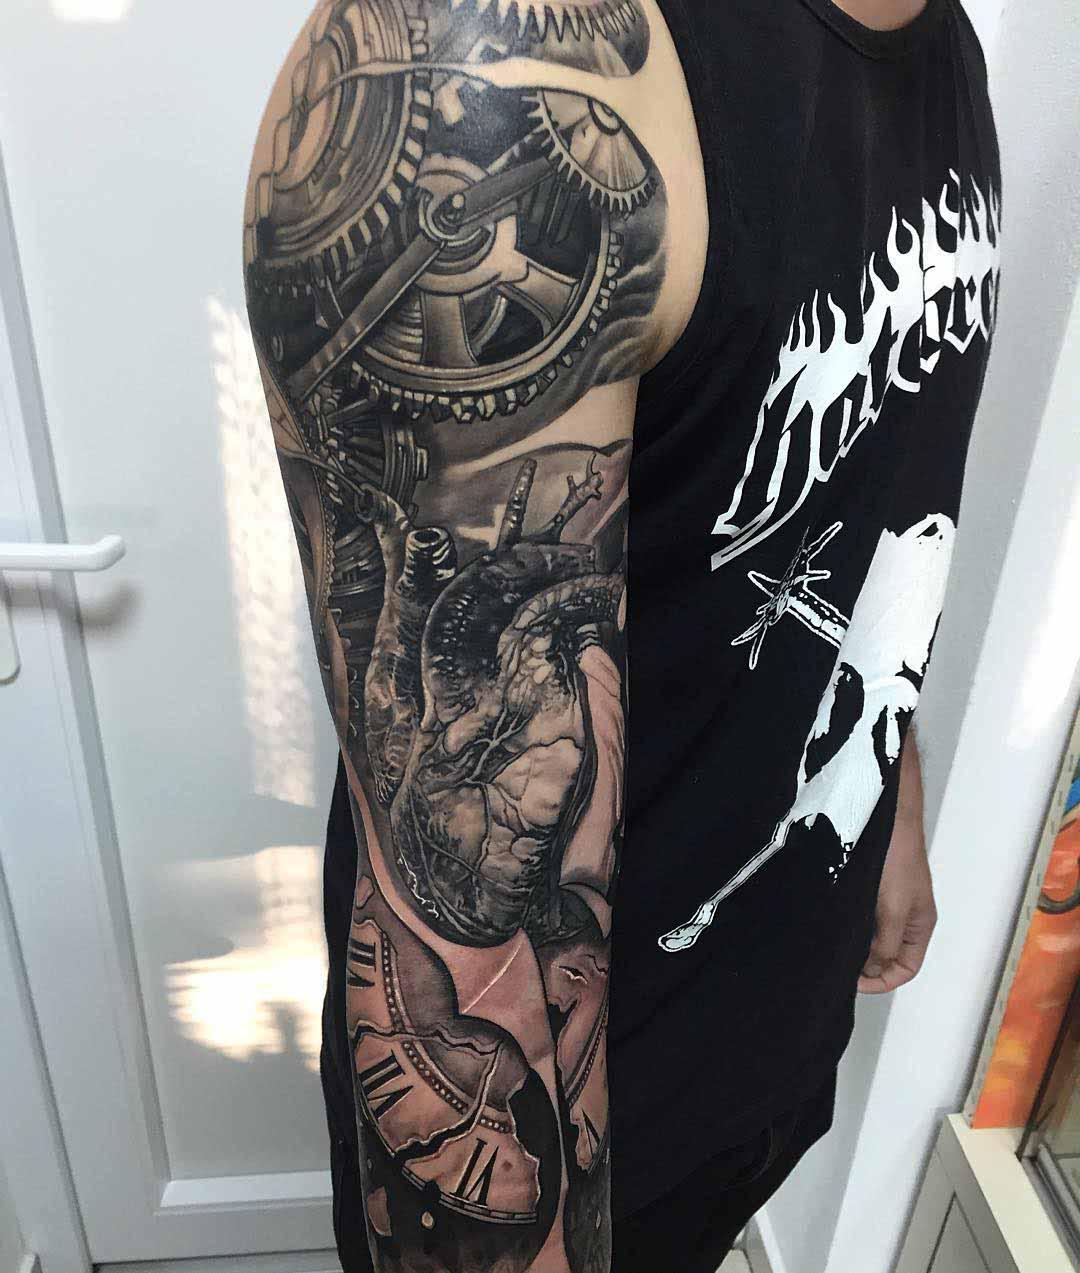 heart and cogwheels tattoo sleeve